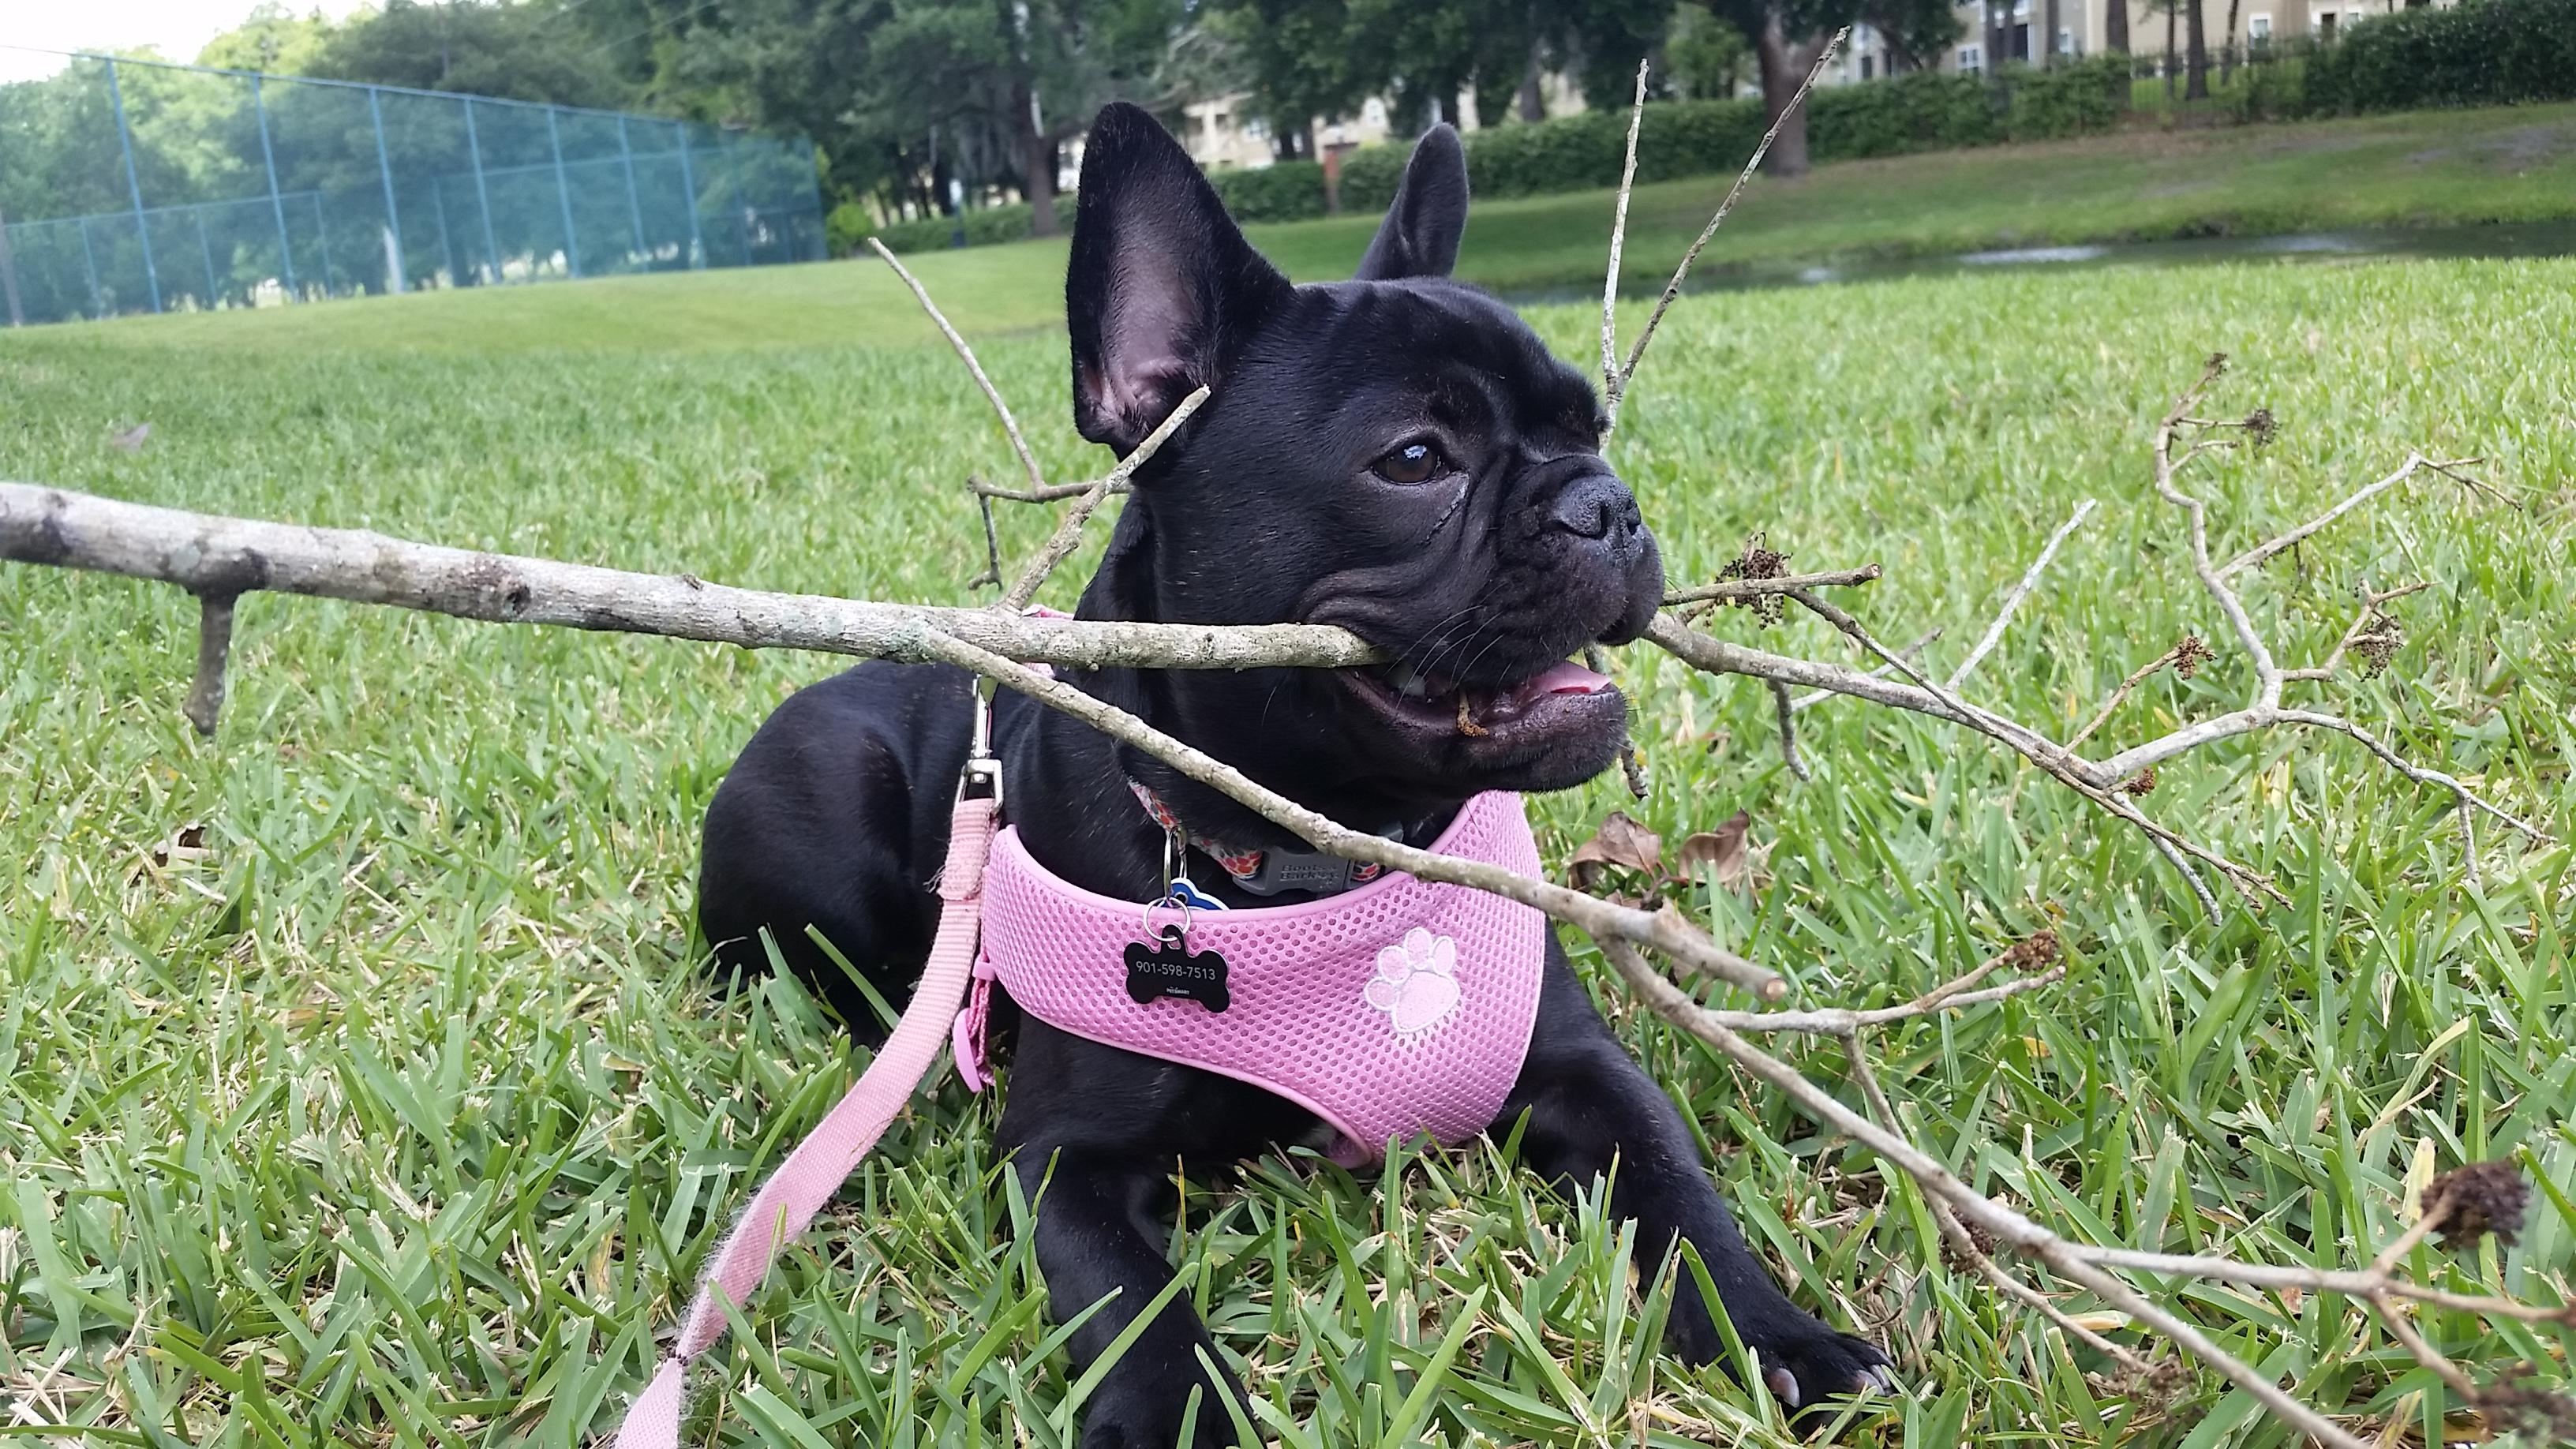 Pet Sitting Lakeland - The Pet Nanny Lakeland